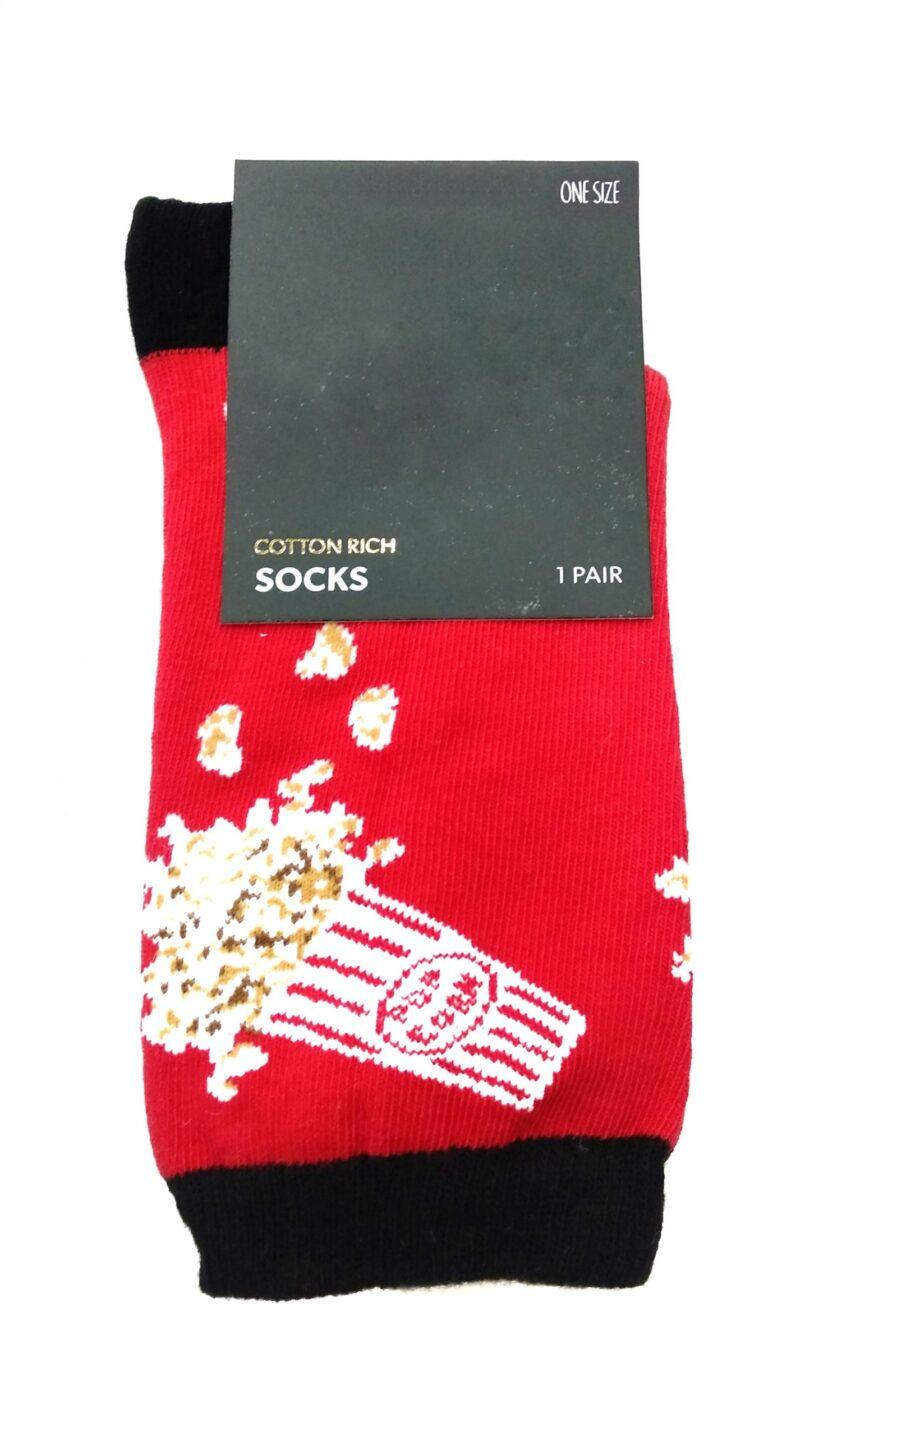 sock-pop-corn-red-ekmen-scaled-1.jpeg